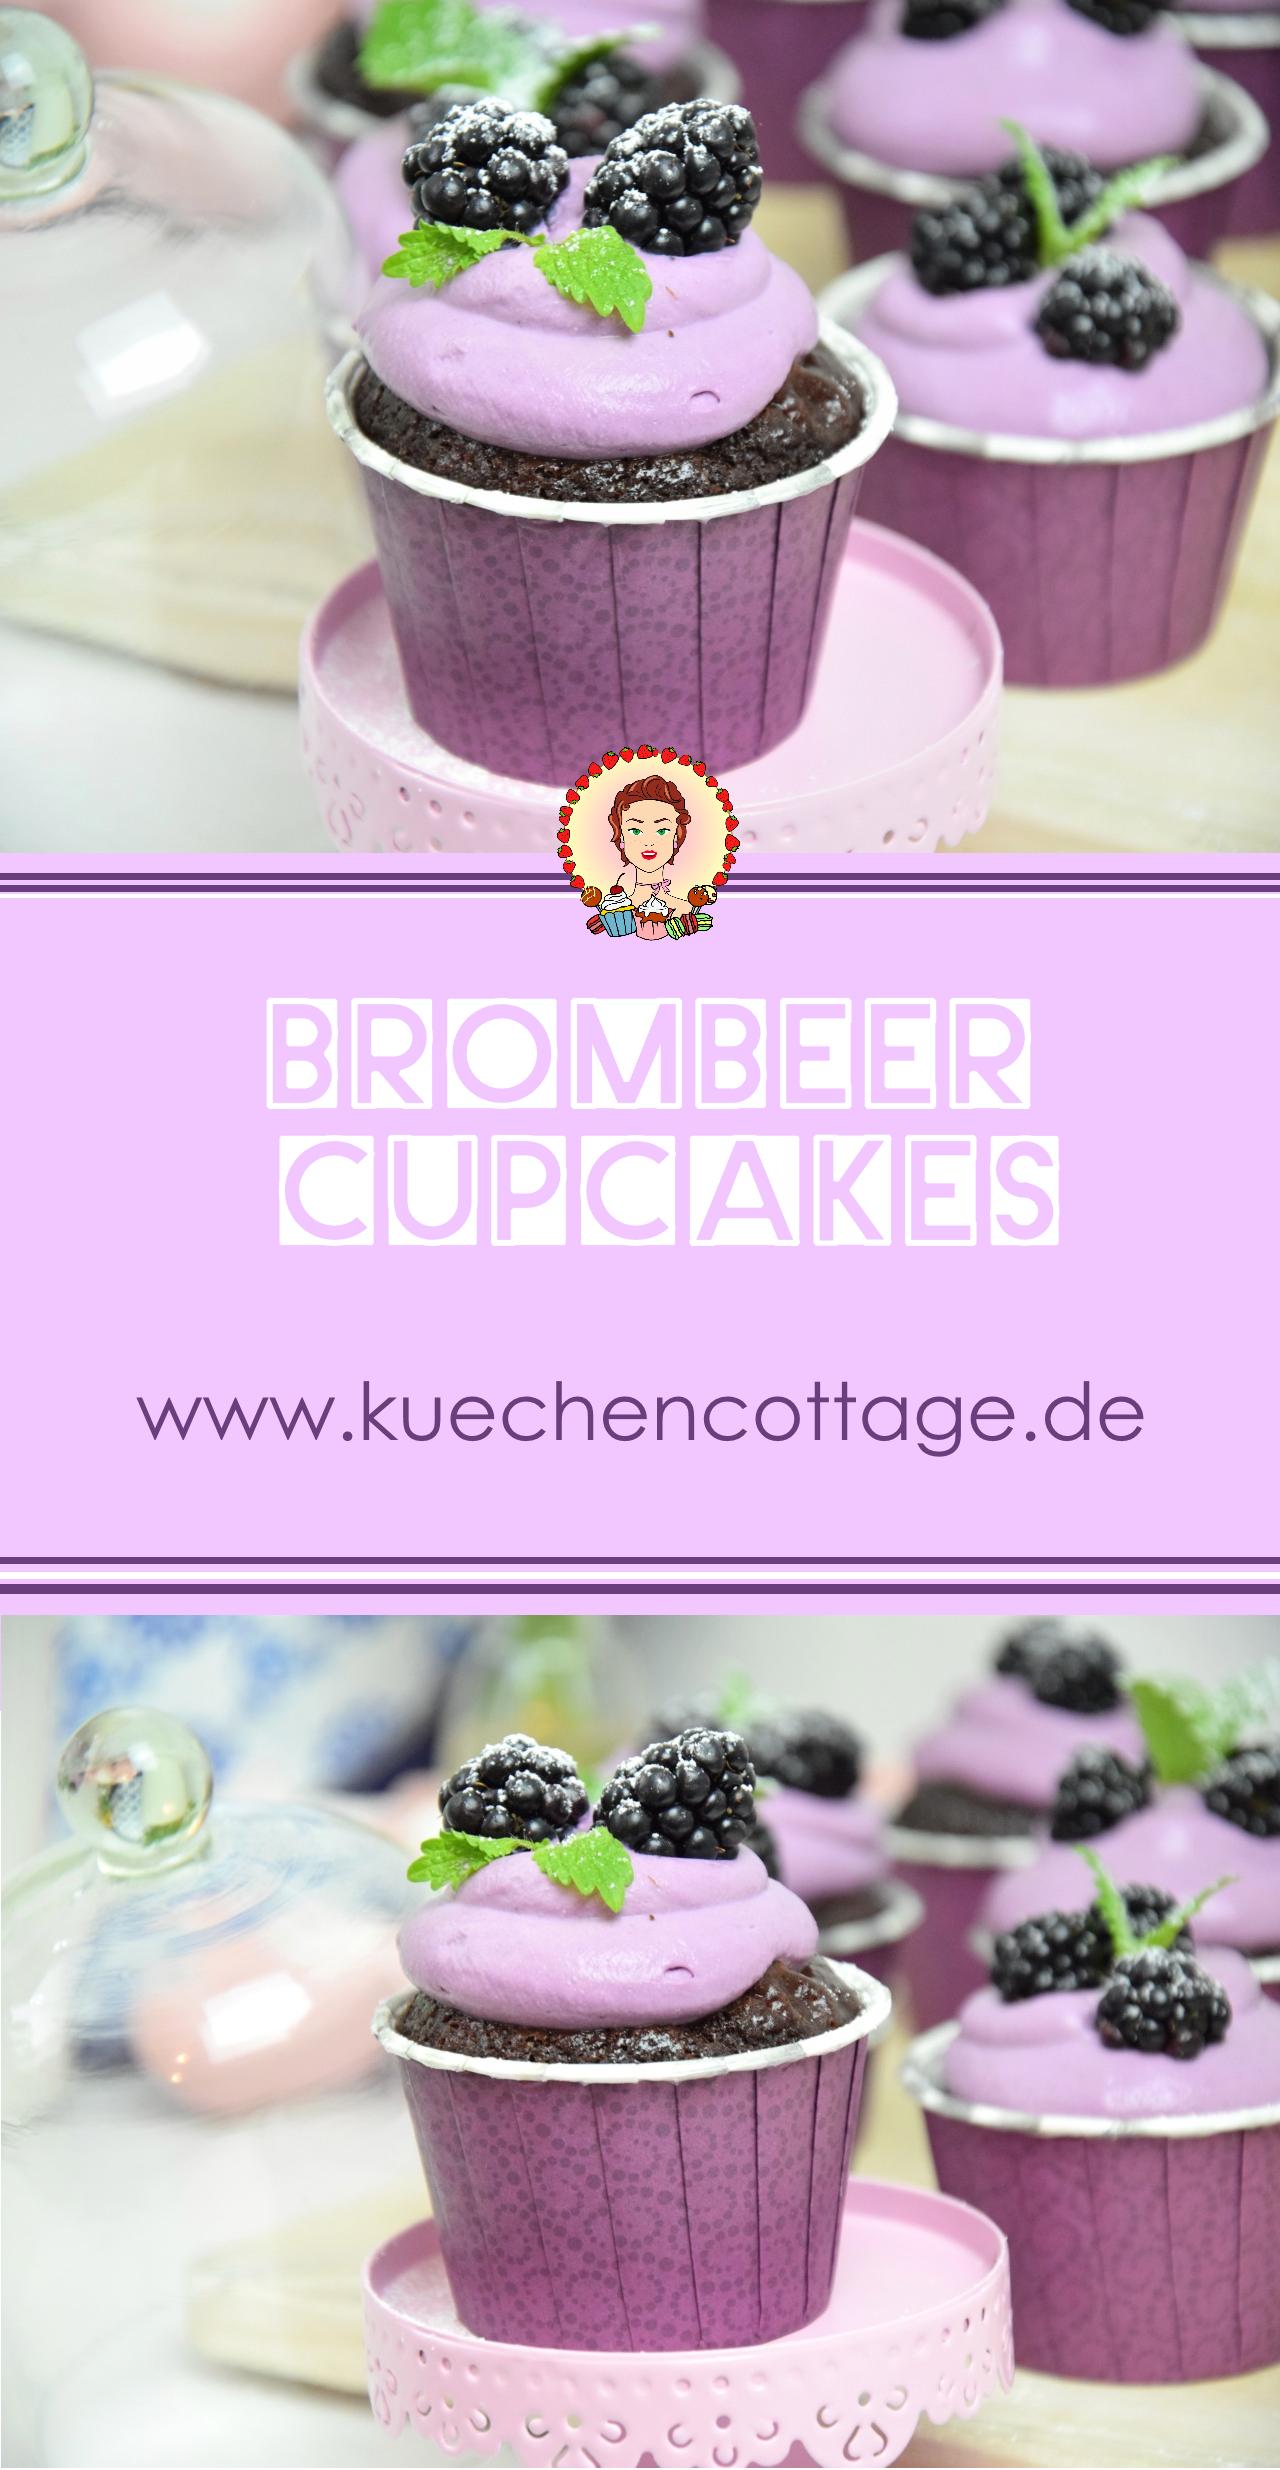 brombeer cupcakes lila dess gek pinterest kuchen backen s leckere kuchen. Black Bedroom Furniture Sets. Home Design Ideas